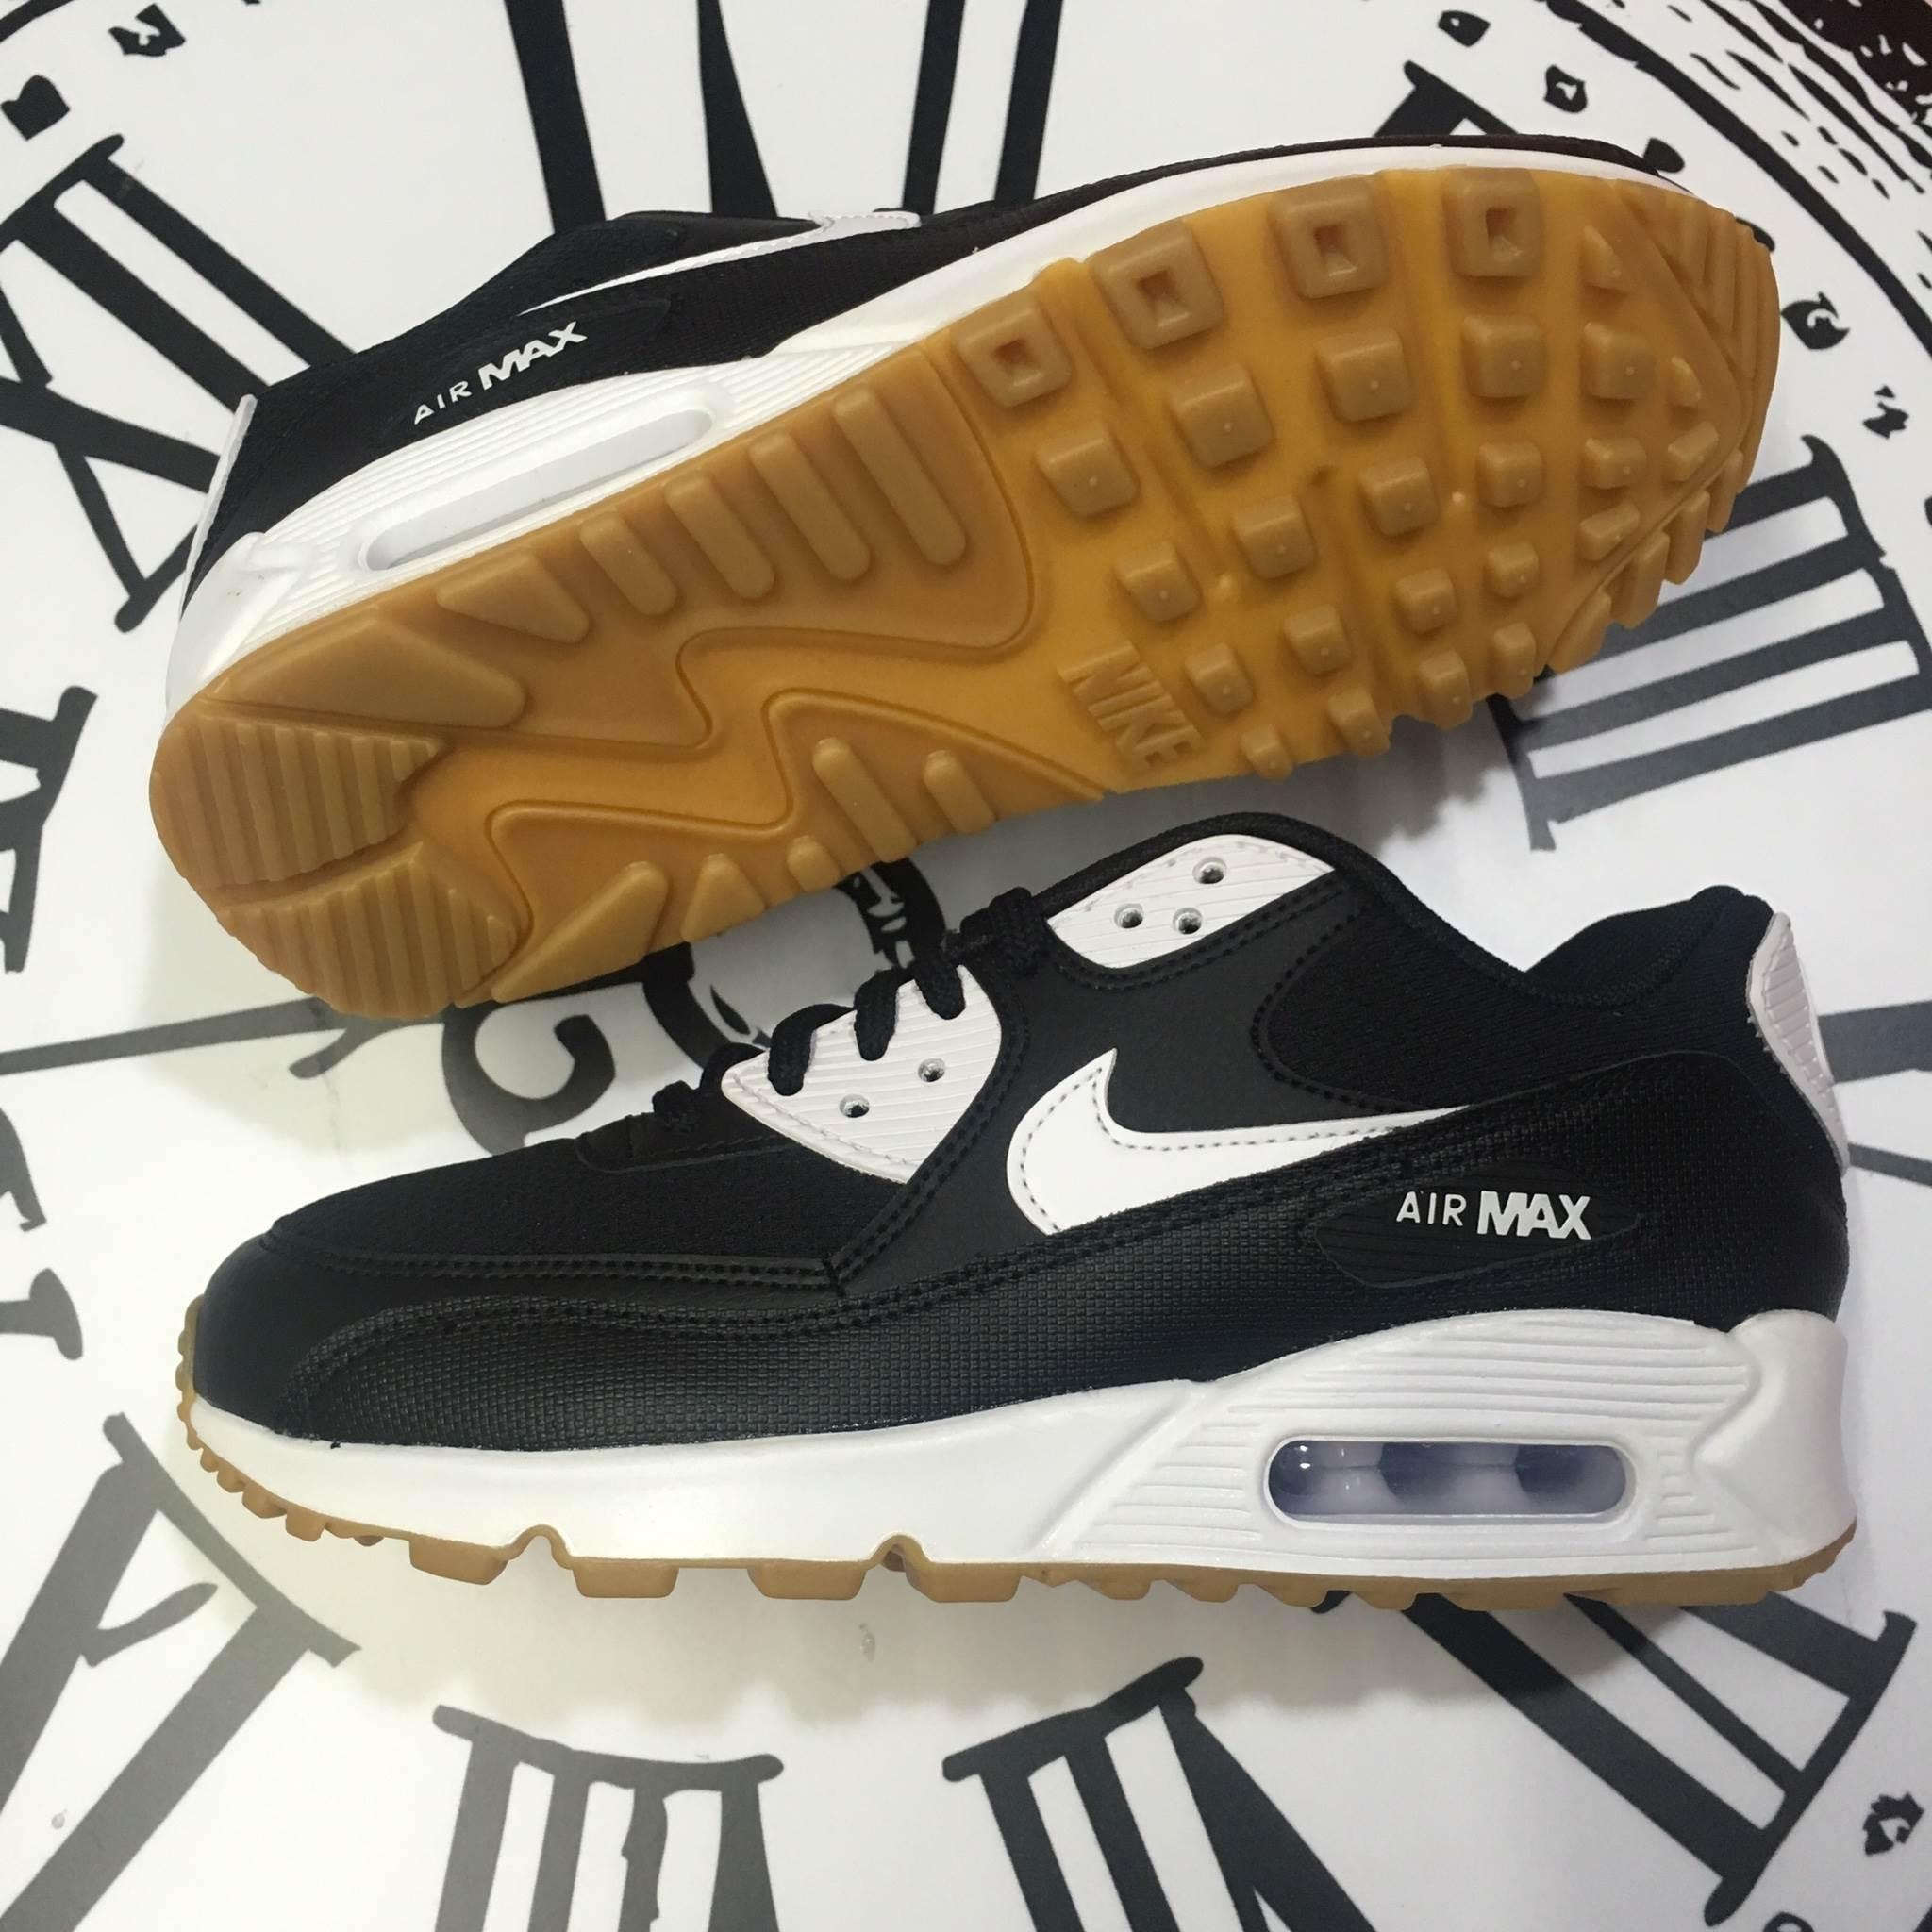 1dc8bf6d7a NIKE AIR MAX 90 運動休閒鞋女款325213-055